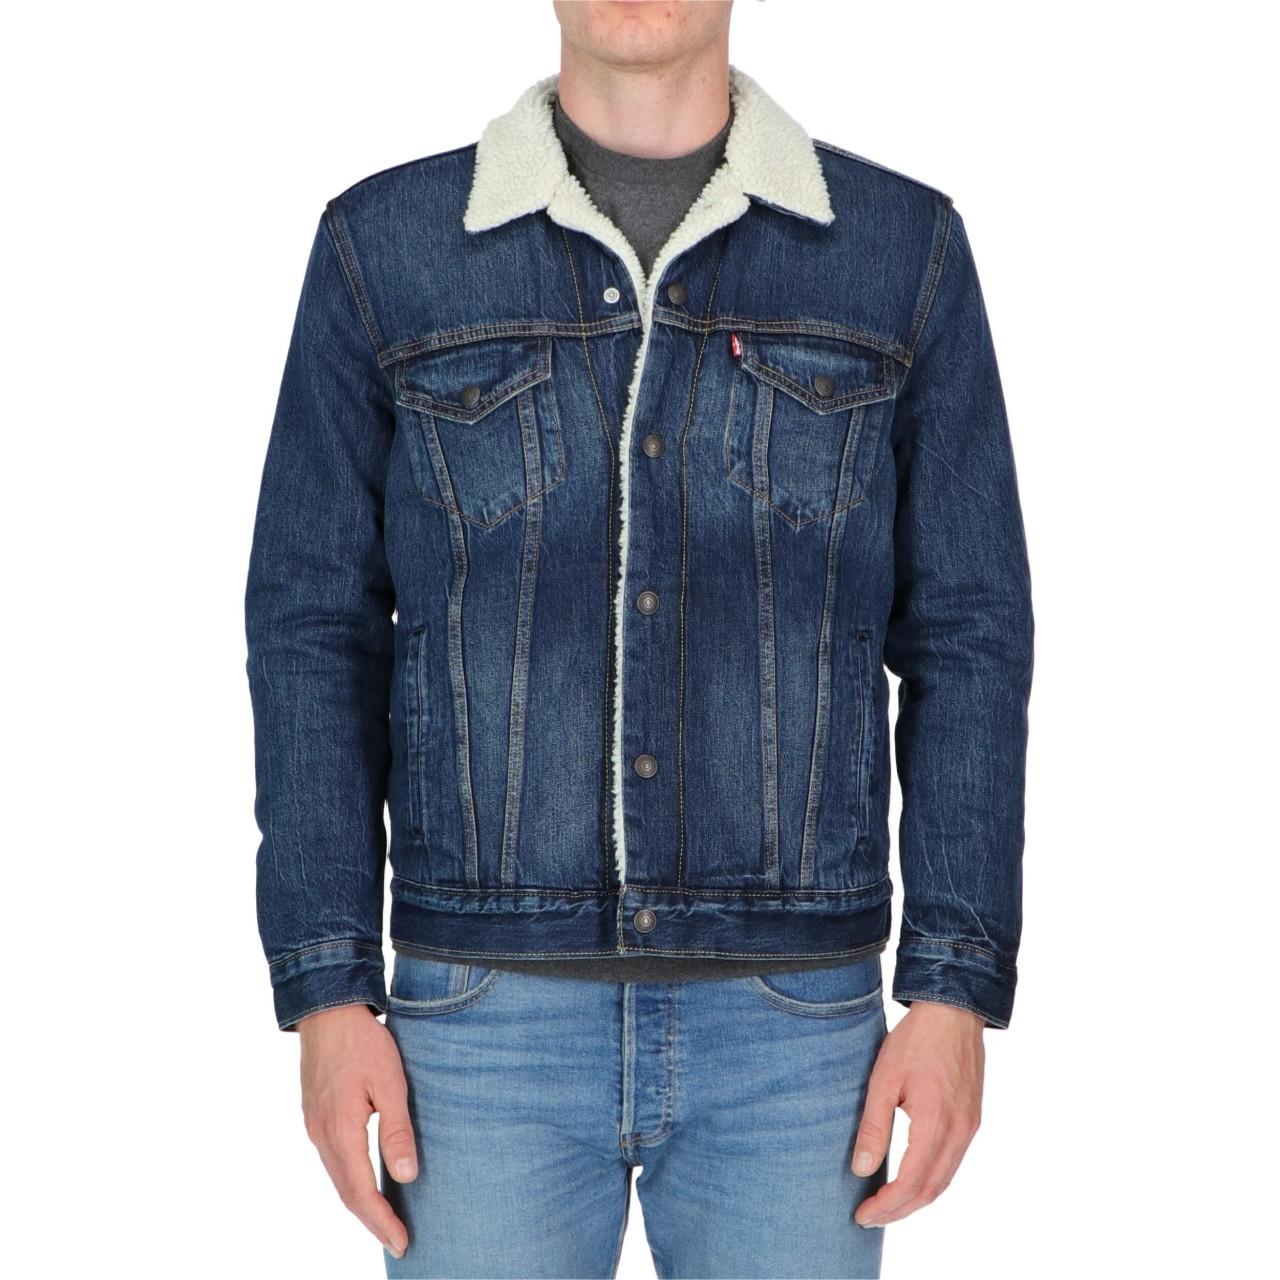 Levi's Uomo Giacca Levi's Uomo Sherpa Jeans 16365M